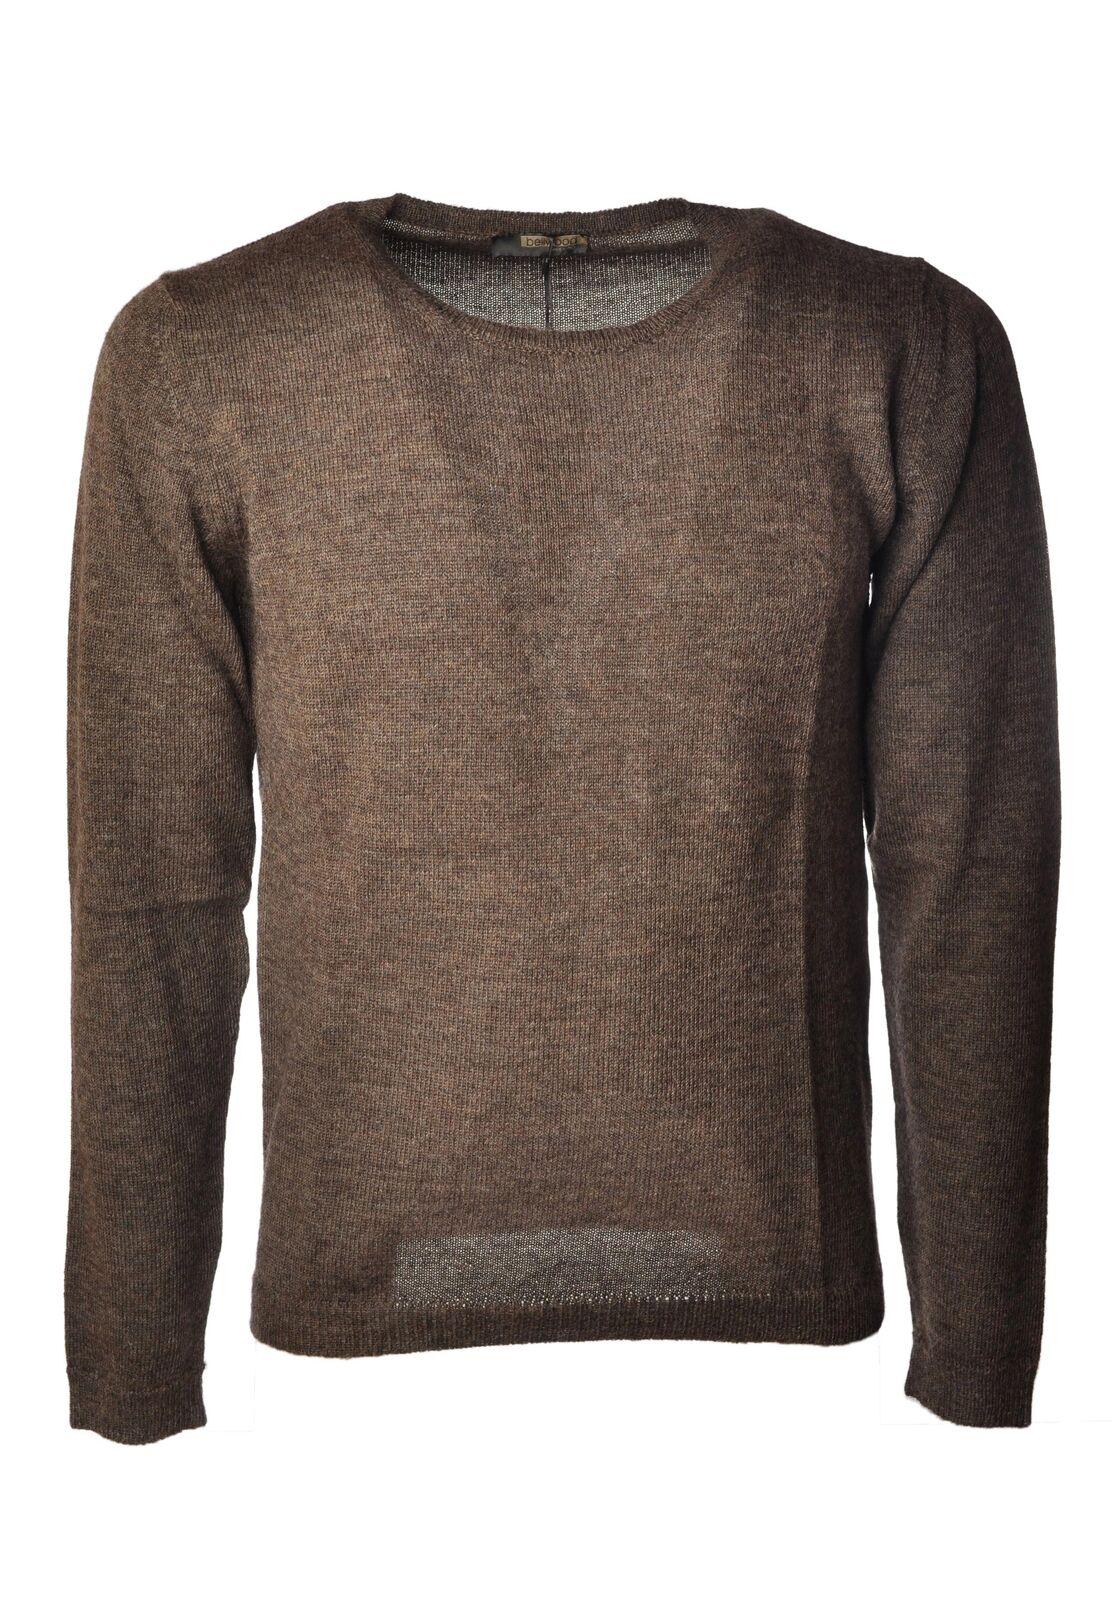 Bellwood  -  Sweaters - Male - Braun - 4162928A184427